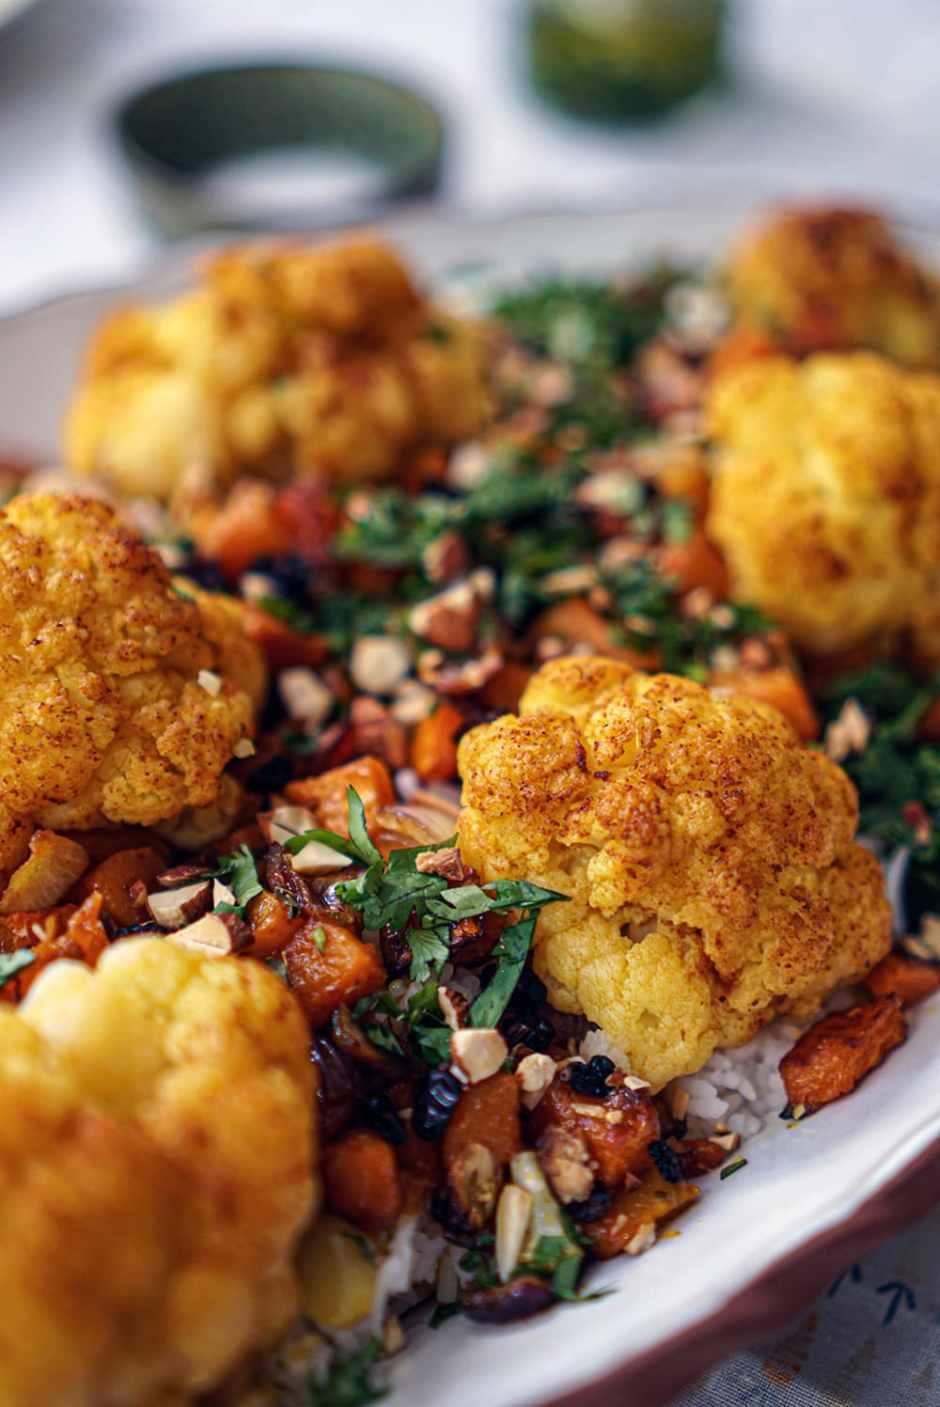 Roasted Cauliflower & Pumpkin over Basmati with Toasted Almond & Barberries